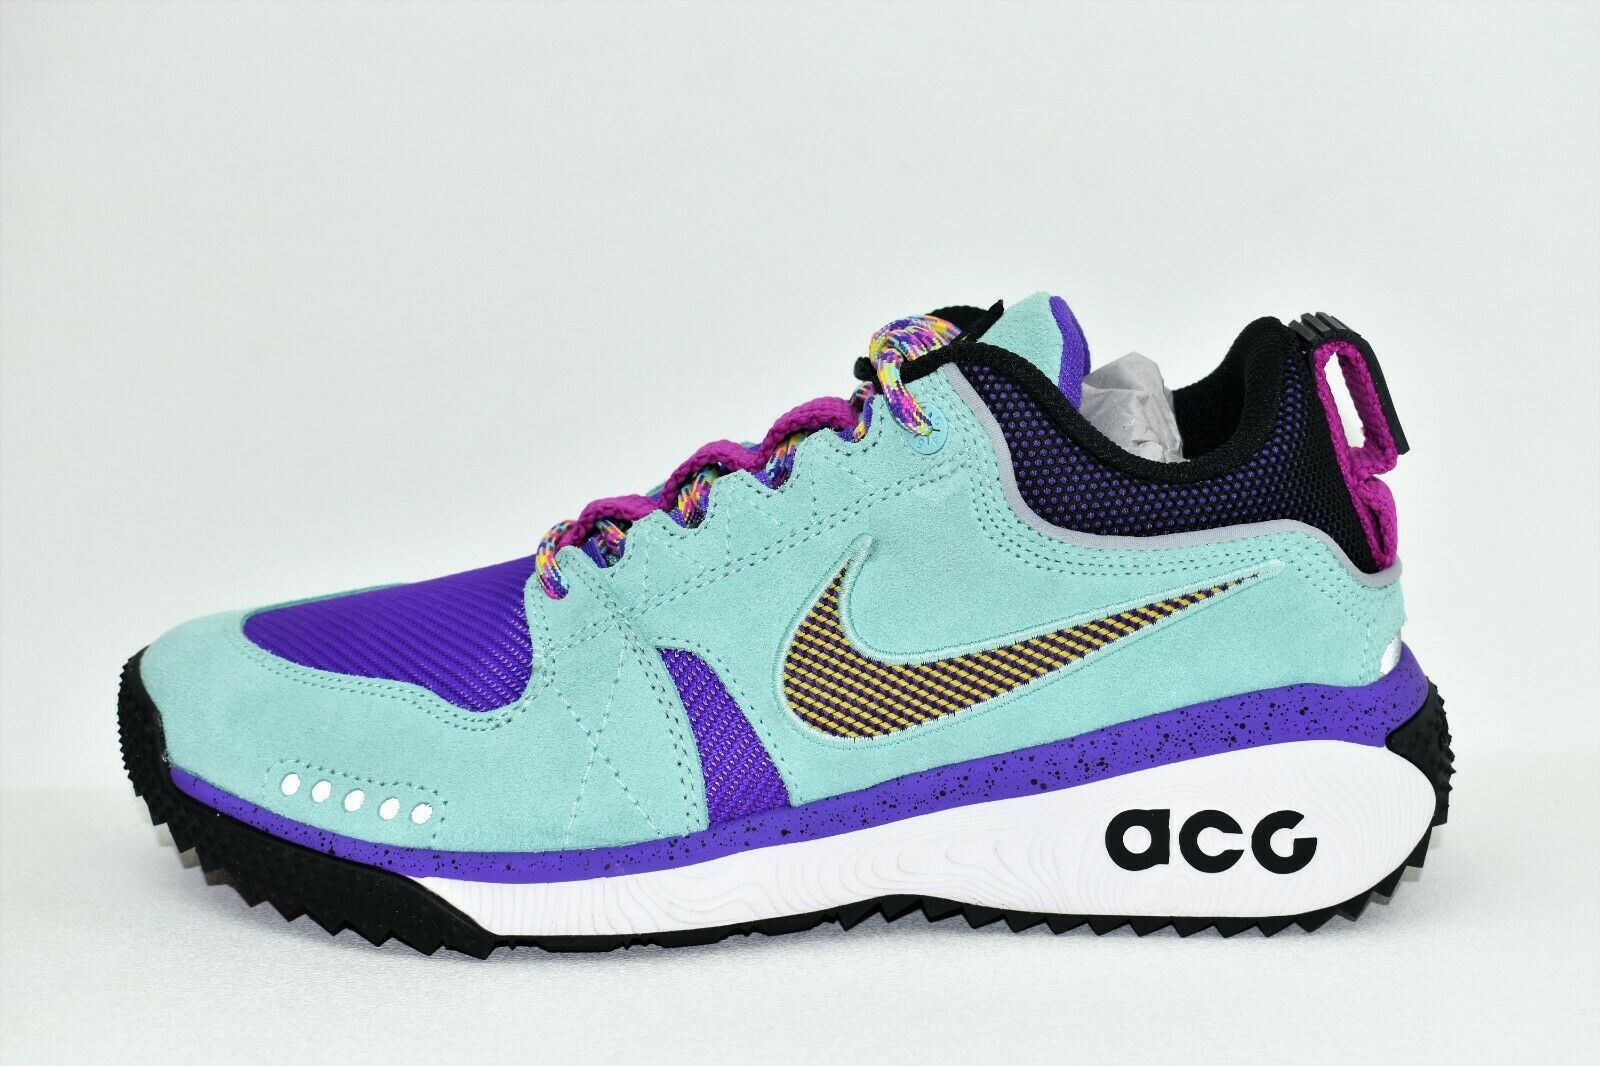 Nike ACG Dog Mountain Mens Size Size Size 9.5 shoes Emerald Rise bluee Purple AQ0916 300 345a9b